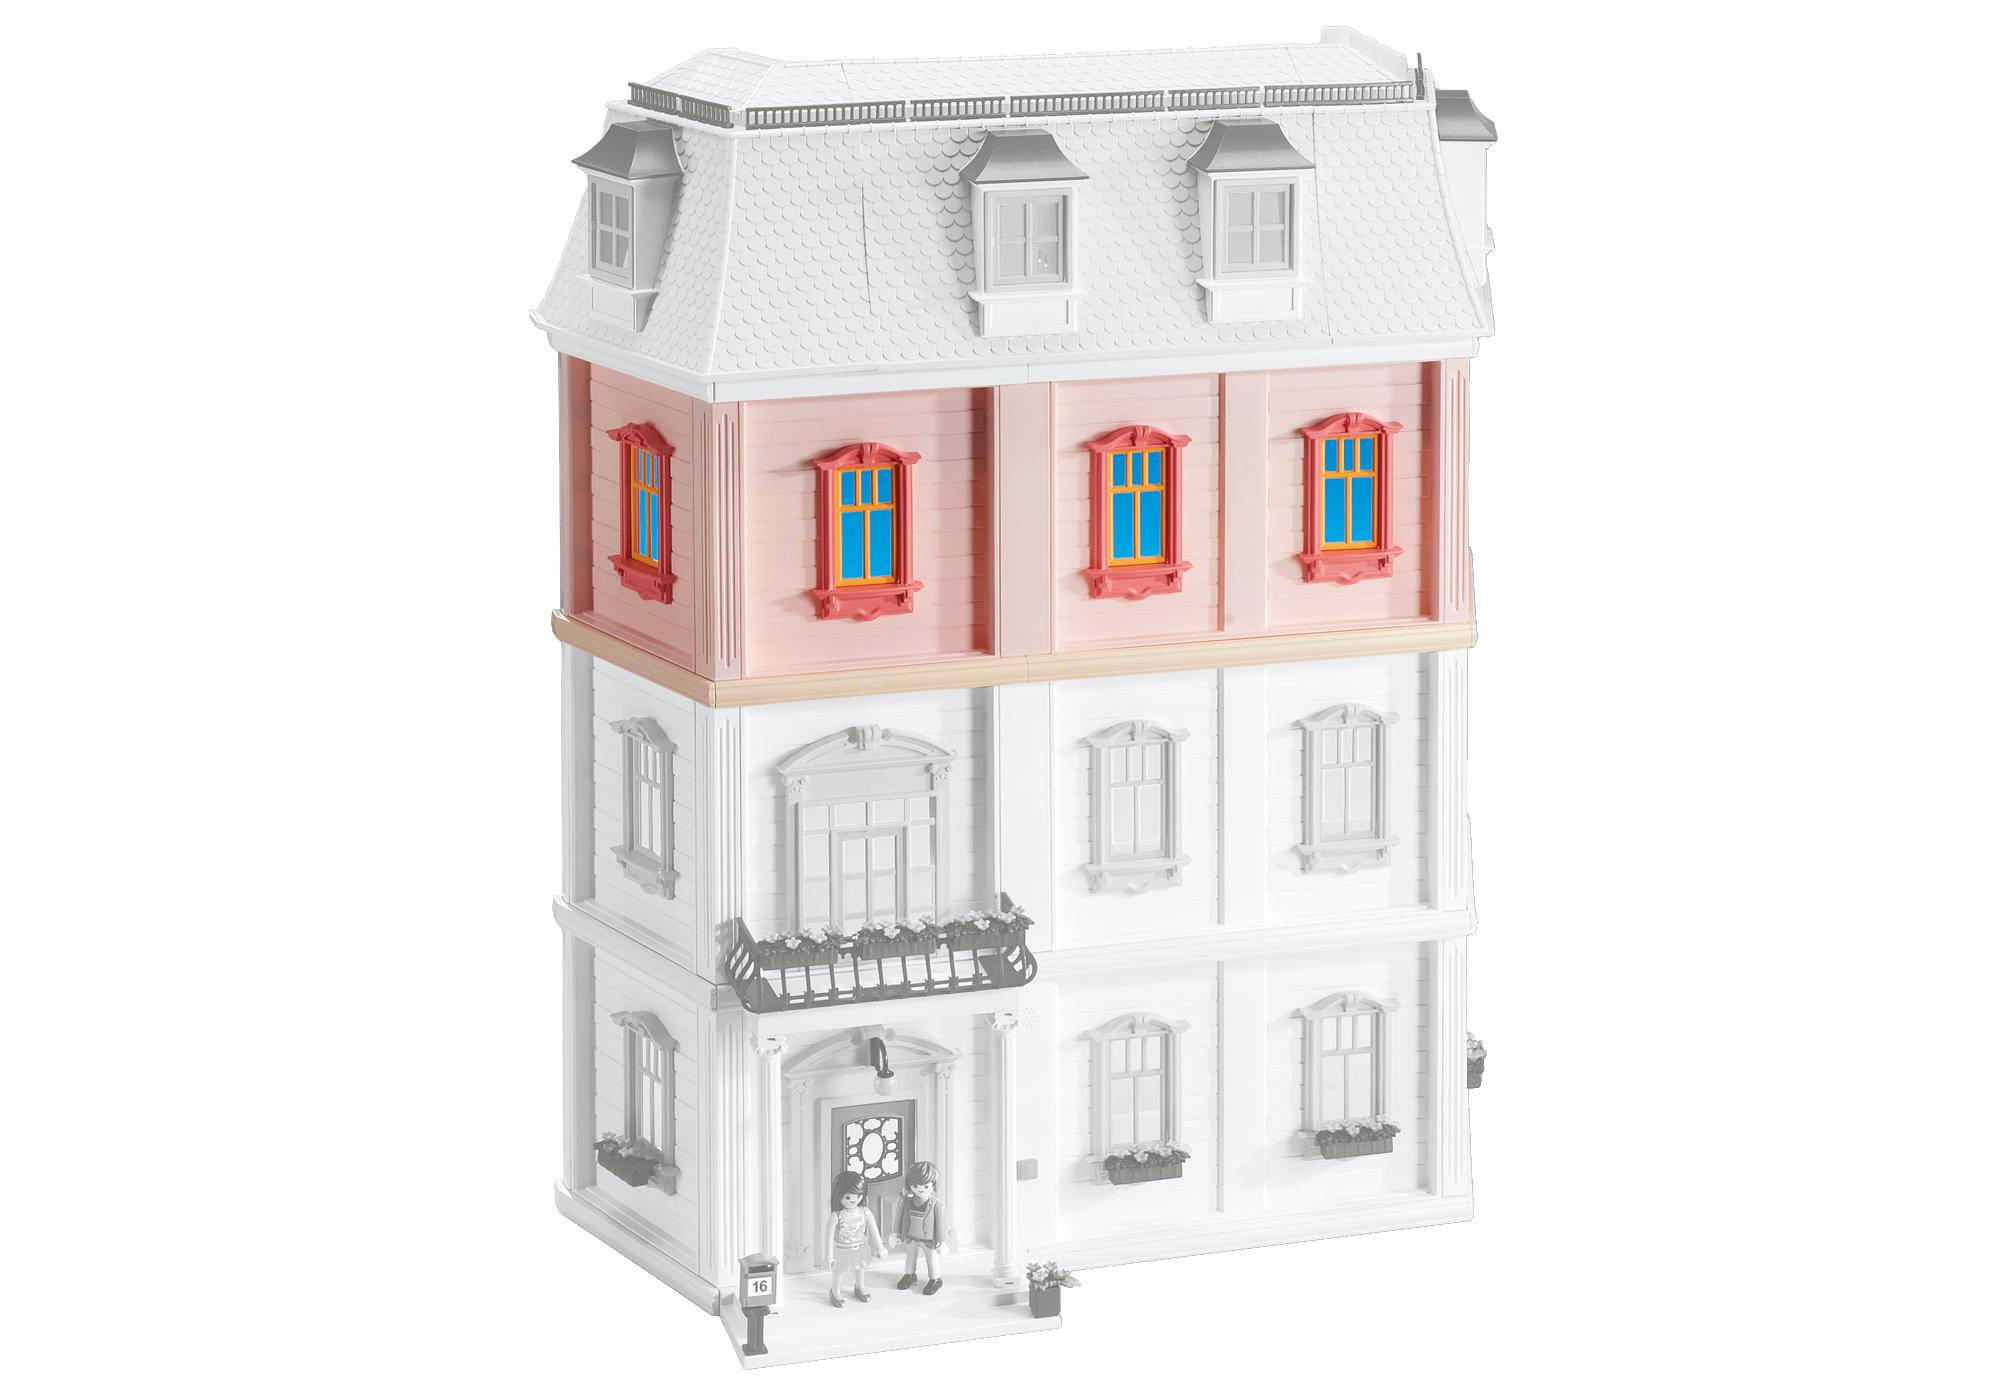 http://media.playmobil.com/i/playmobil/6453_product_detail/Romantisk dukkehus udvidelse B